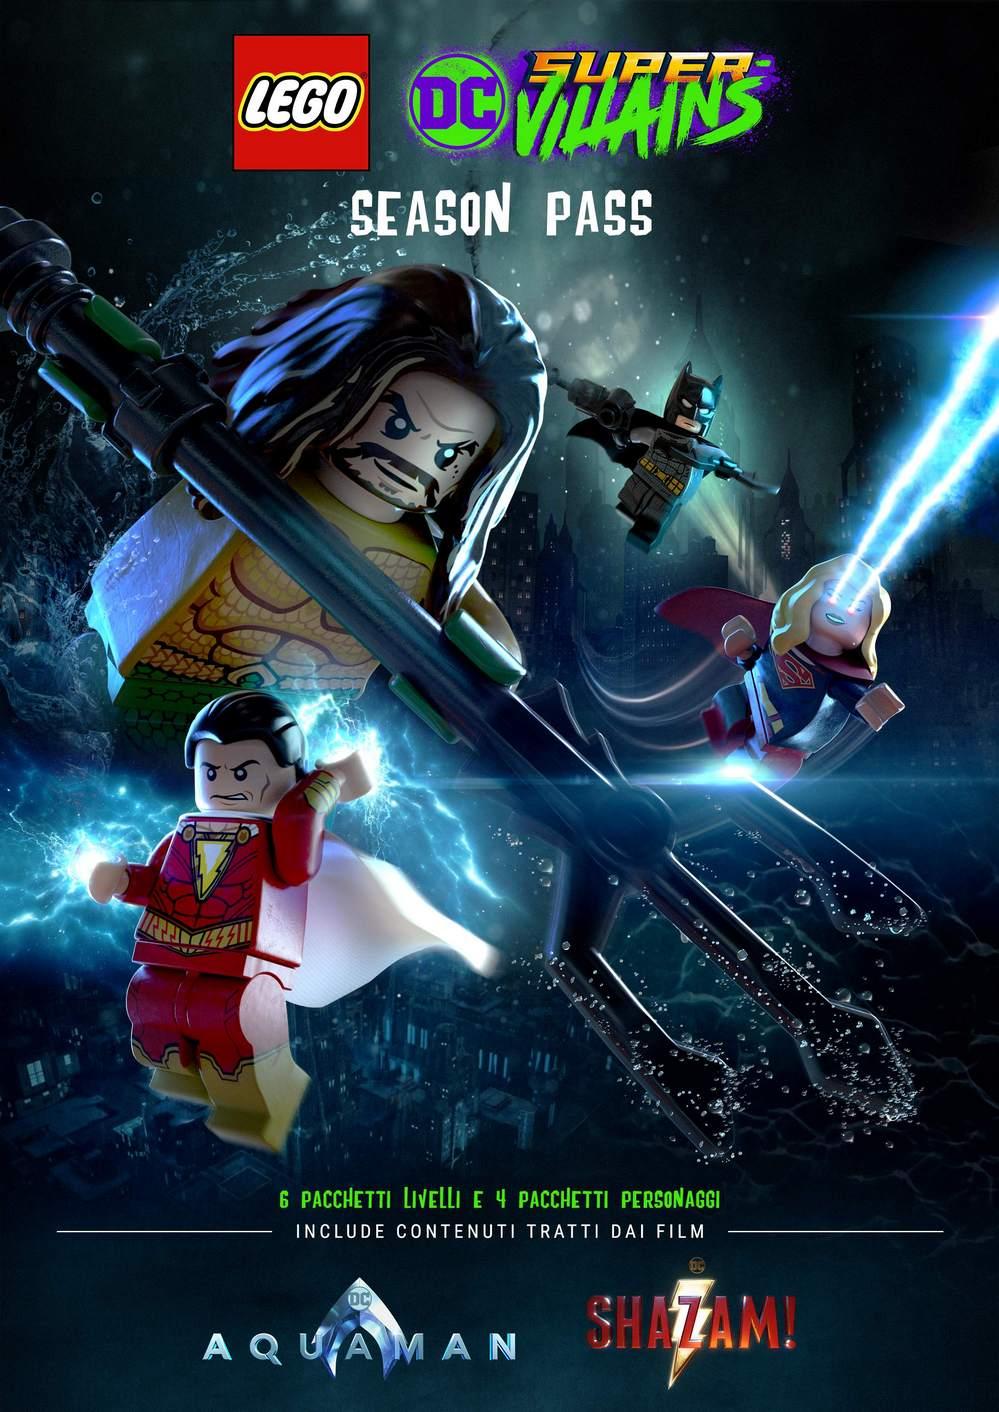 Download Mod Ninja 2 Tak Dff Ifp Only